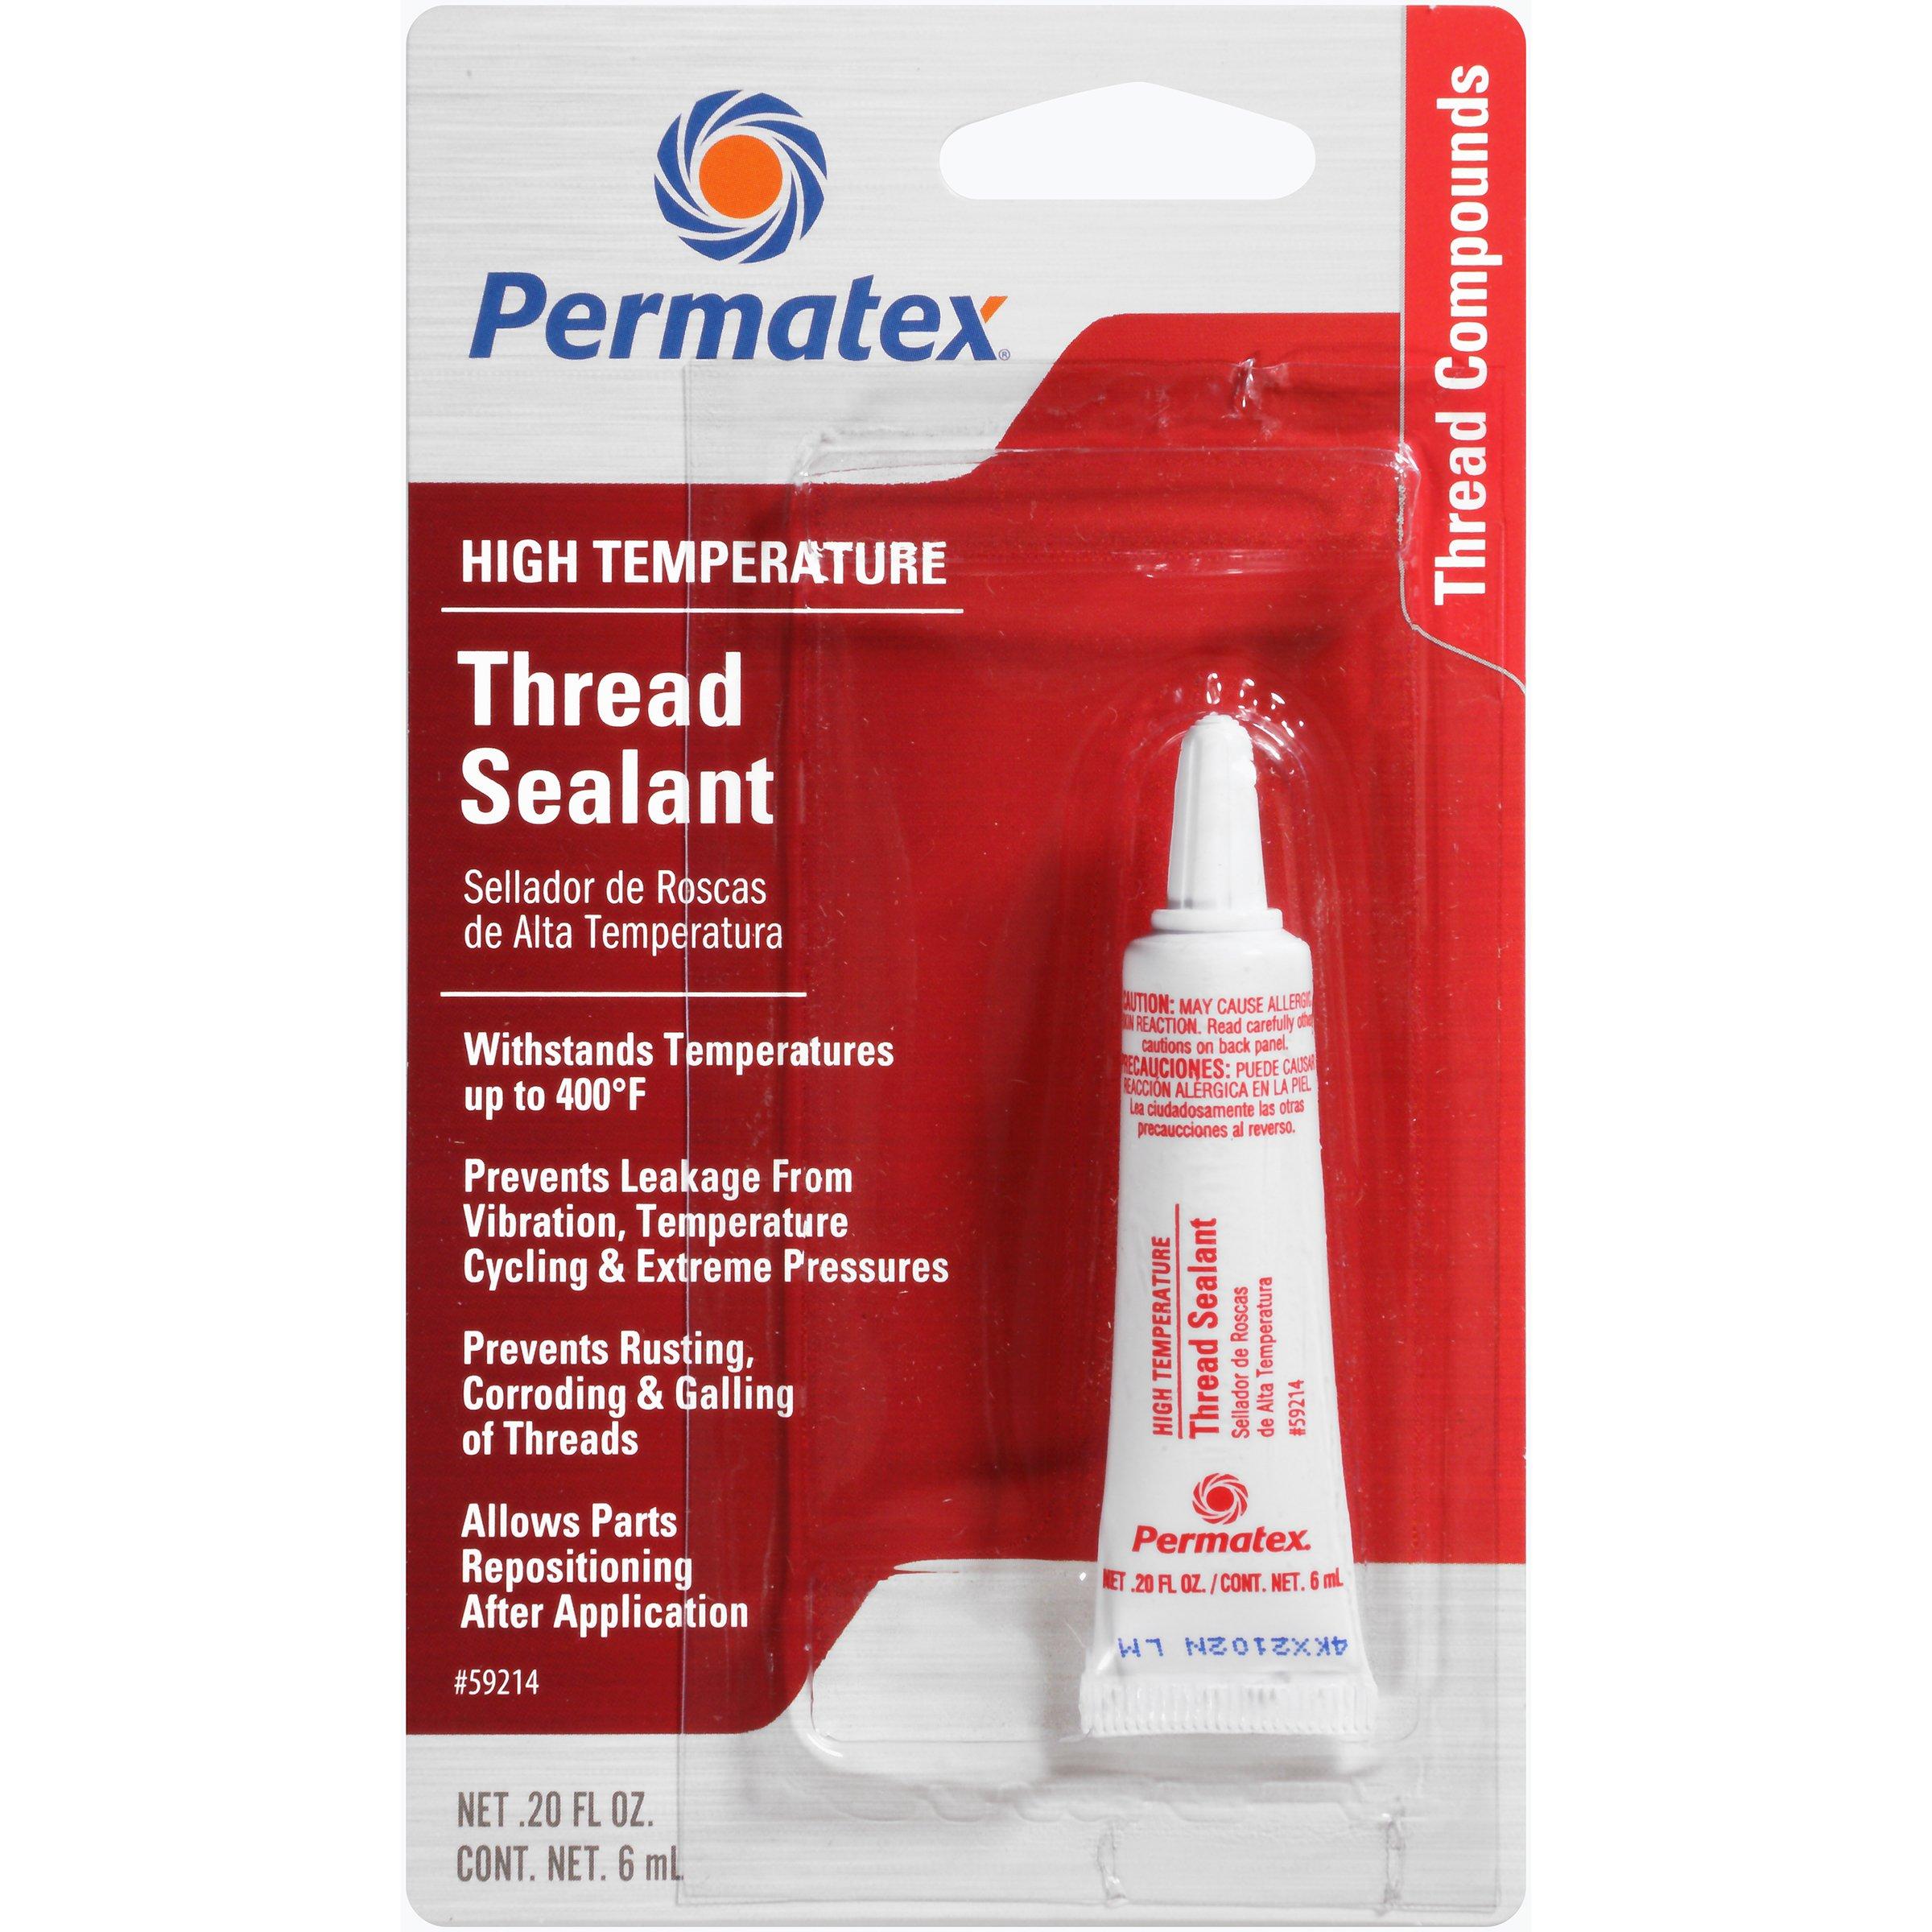 Permatex 59214-12PK High Temperature Thread Sealant, 6 ml (Pack of 12) by Permatex